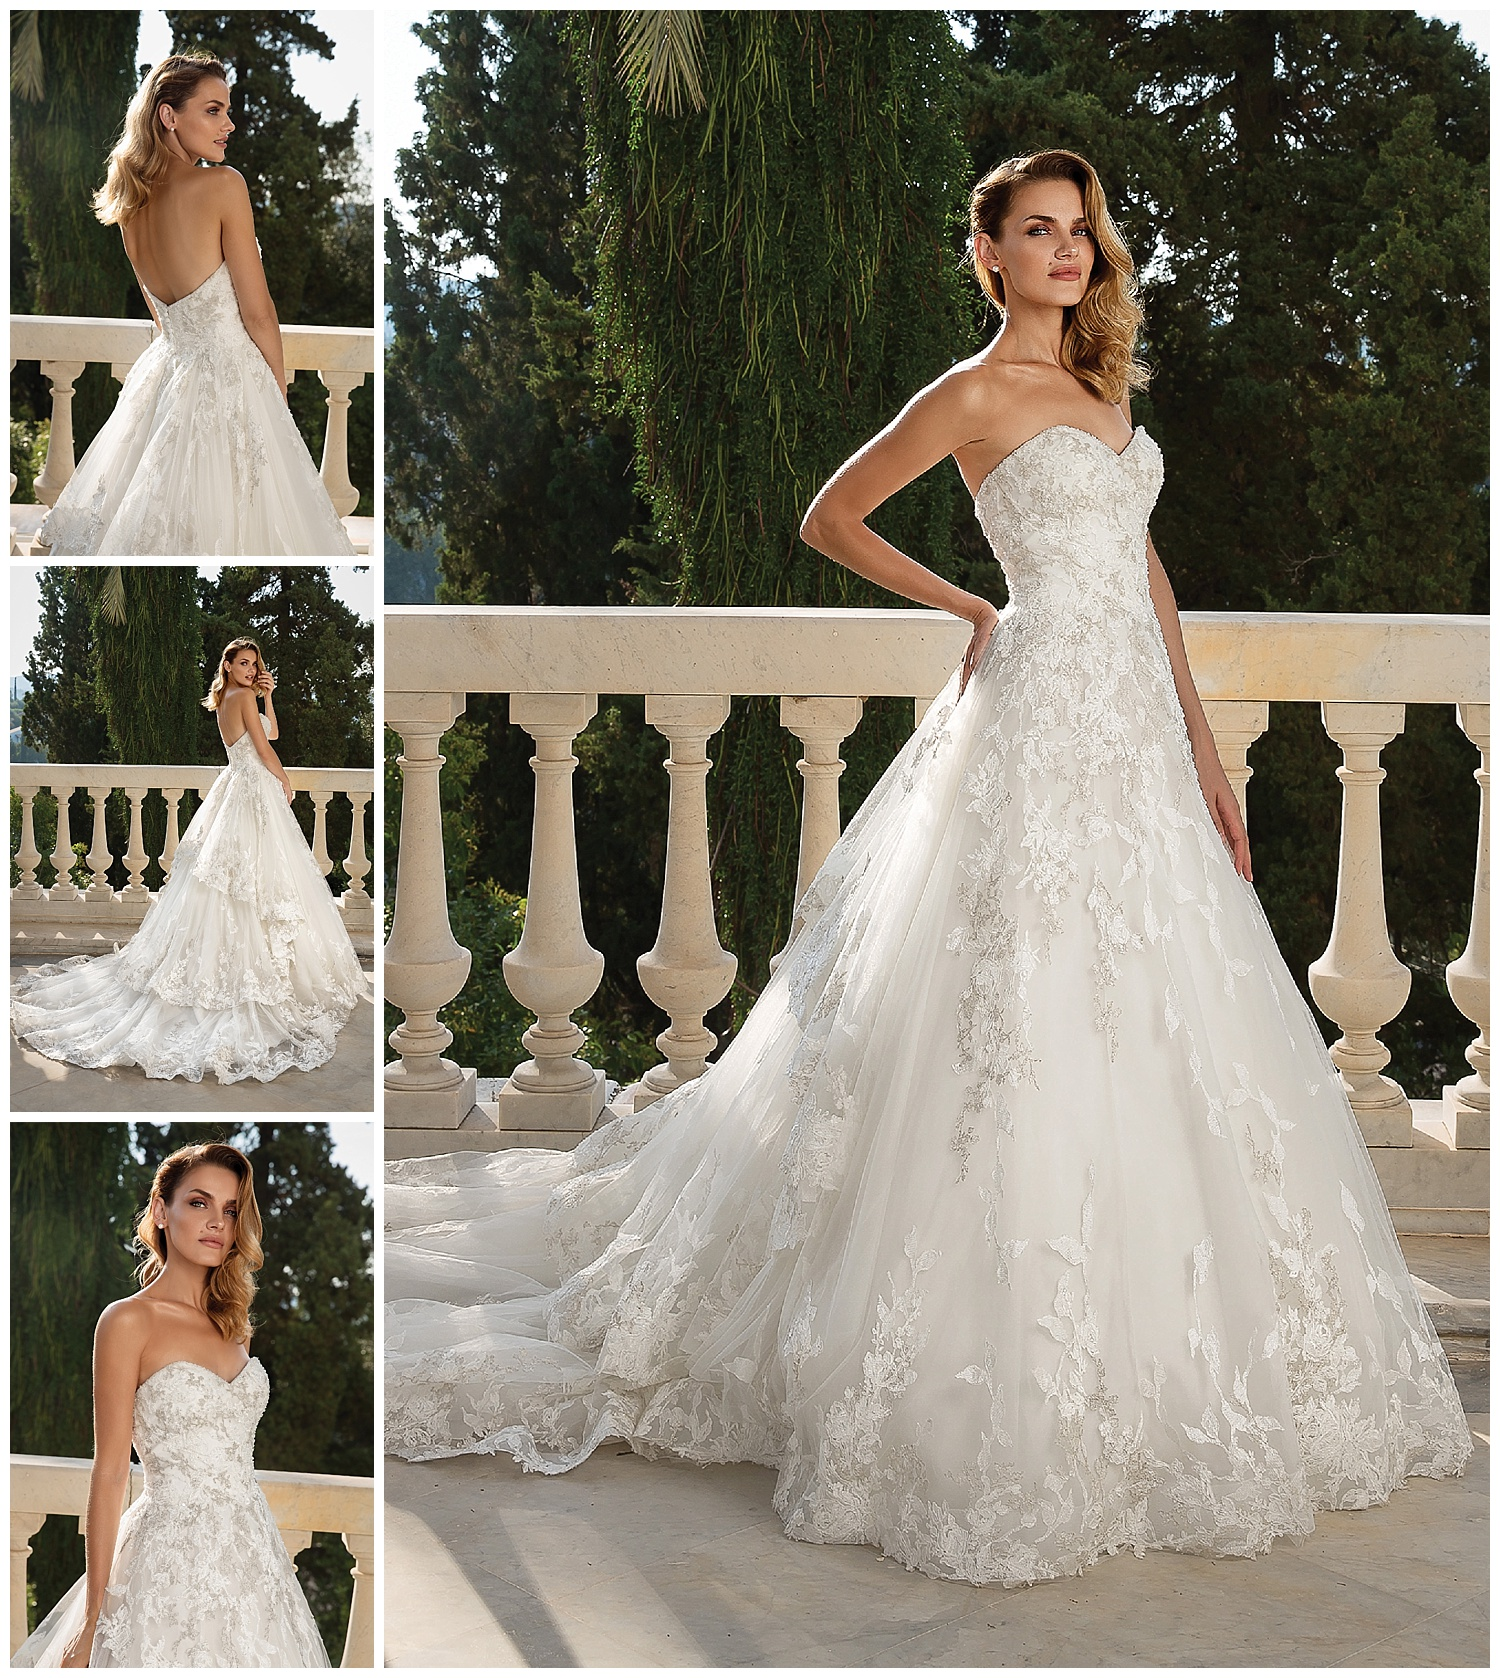 justin-alexander-88098-strapless-ballgown-epiphany-boutique-carmel-california.jpg